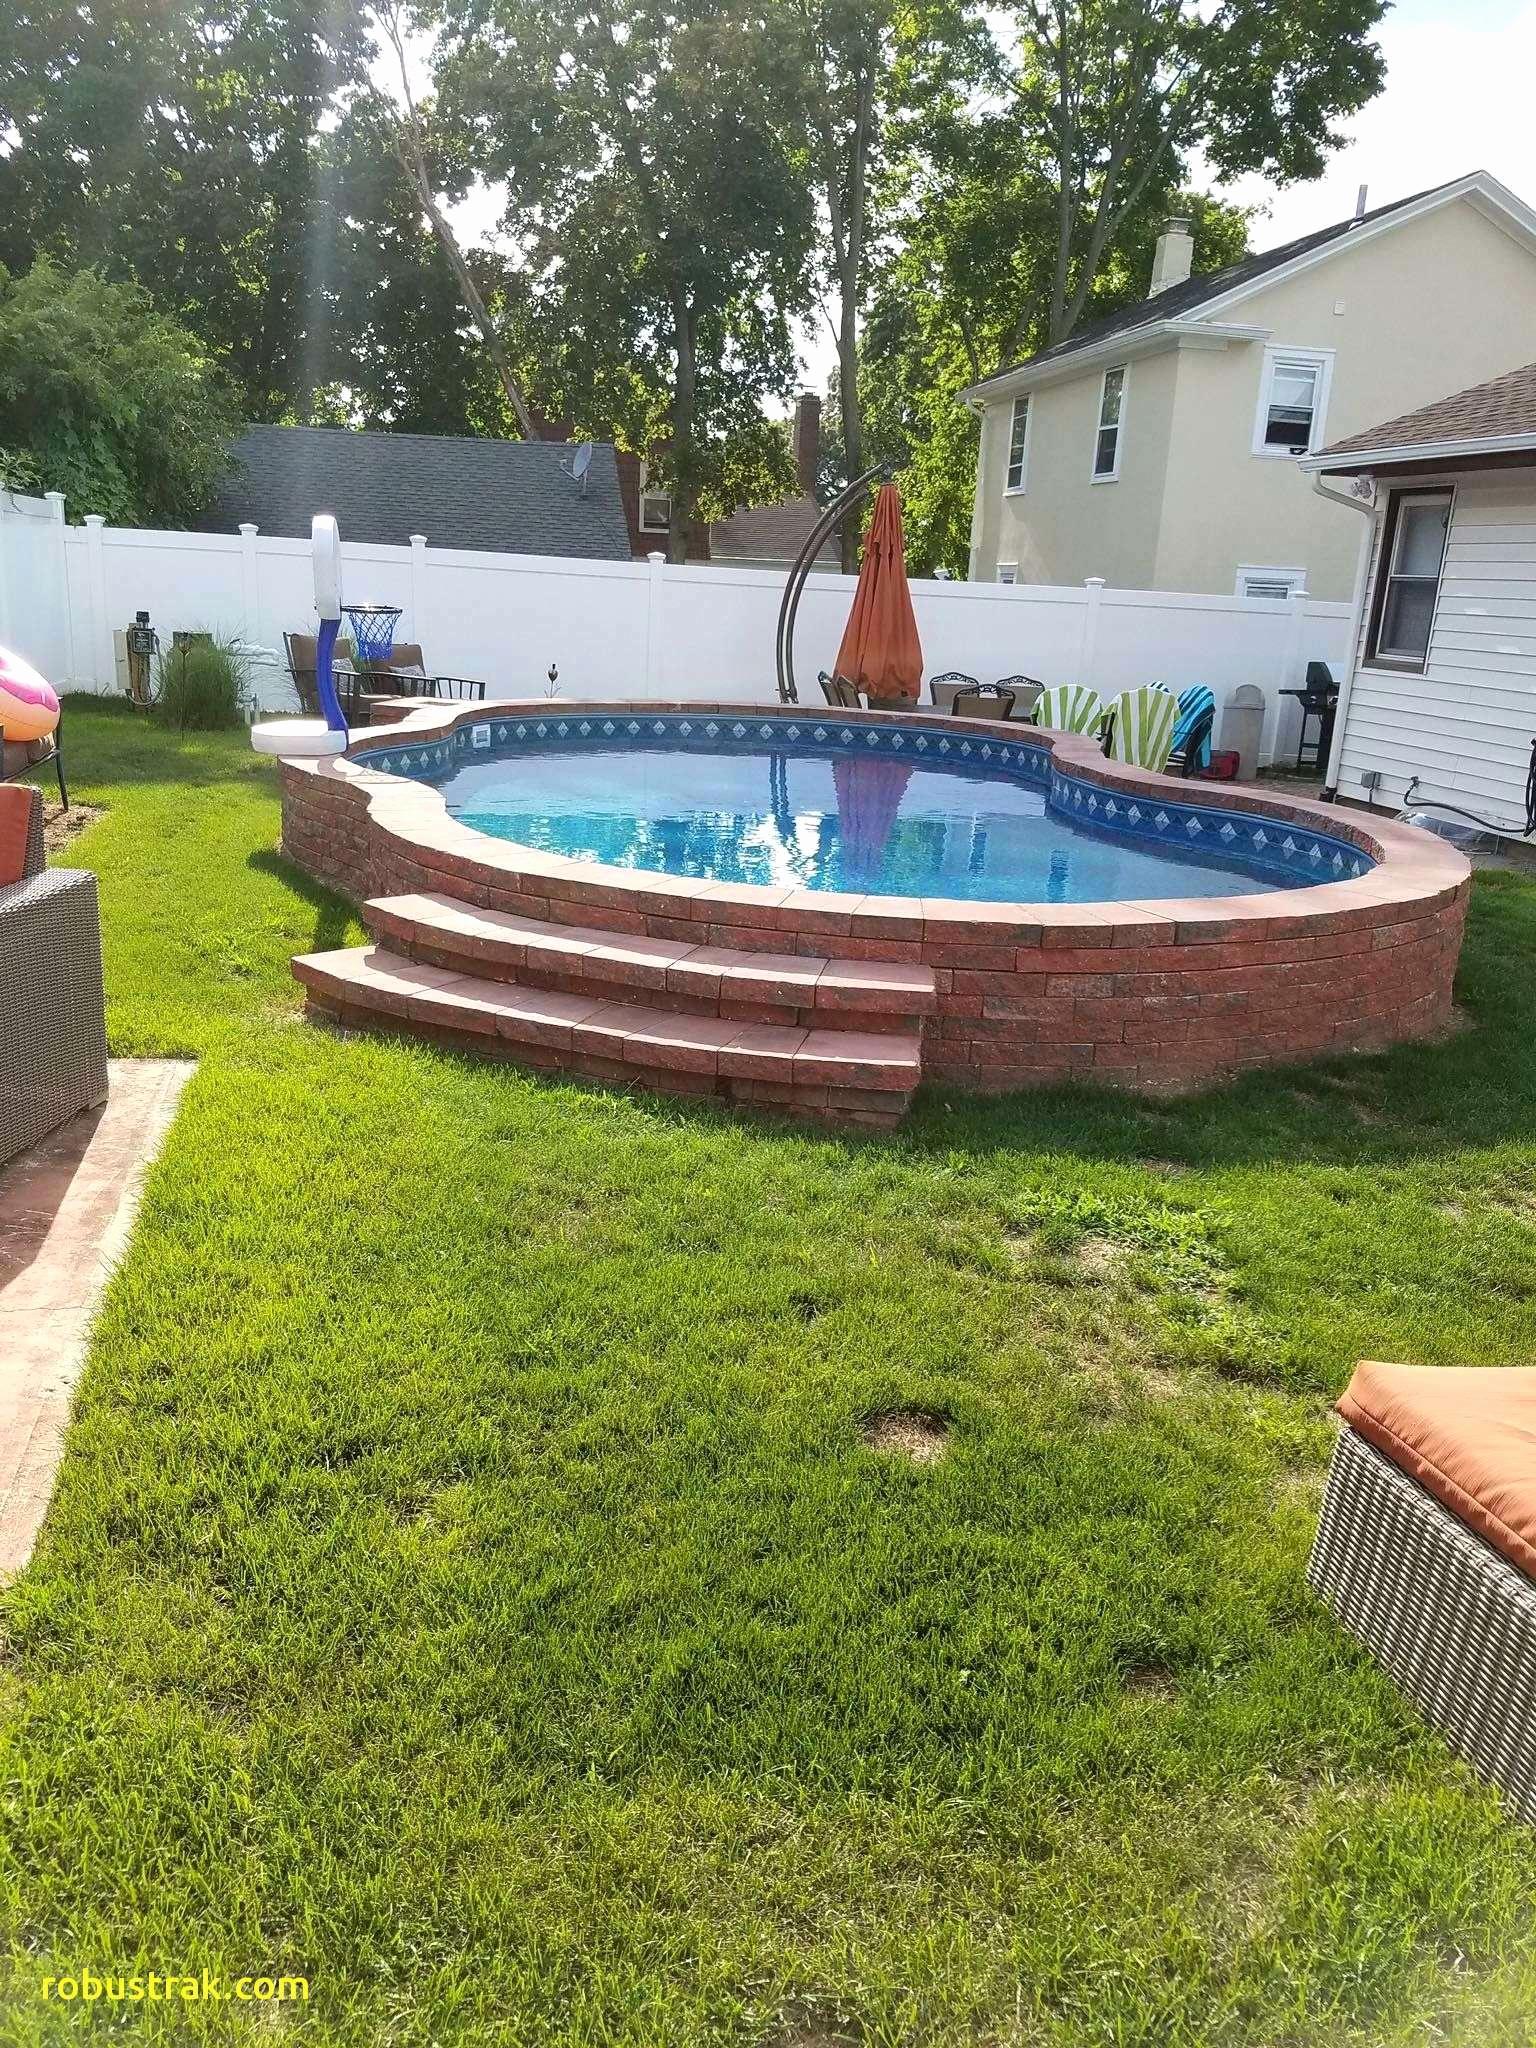 garden water features photo of kleiner garten das beste von swimming pool garten neu swimmingpool of garden water features